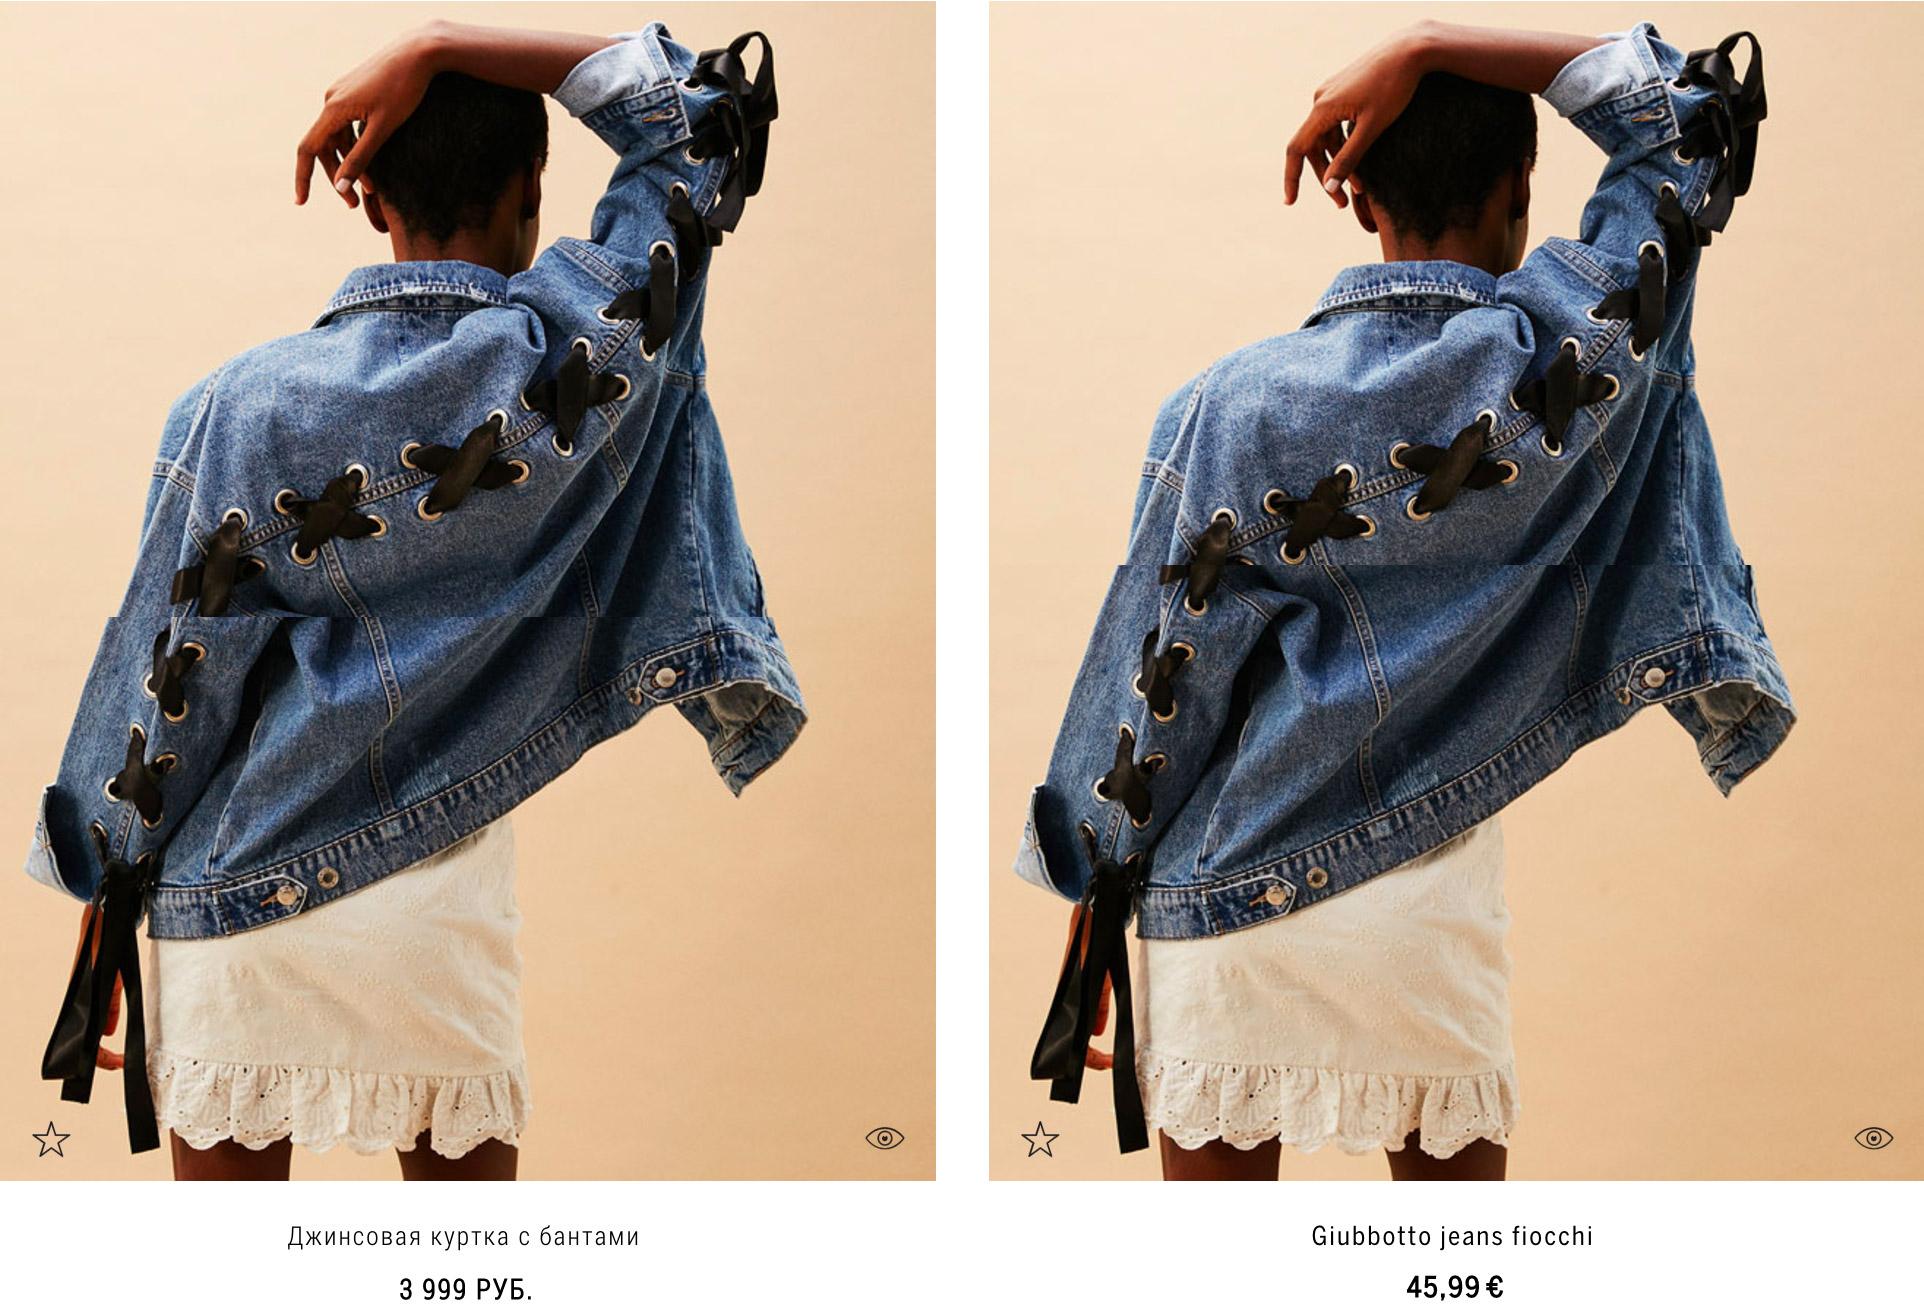 Одна и та же куртка на российском сайте «Бершки» стоит на 1100<span class=ruble>Р</span> дороже, чем на итальянском (45,99€ = 2800<span class=ruble>Р</span>)